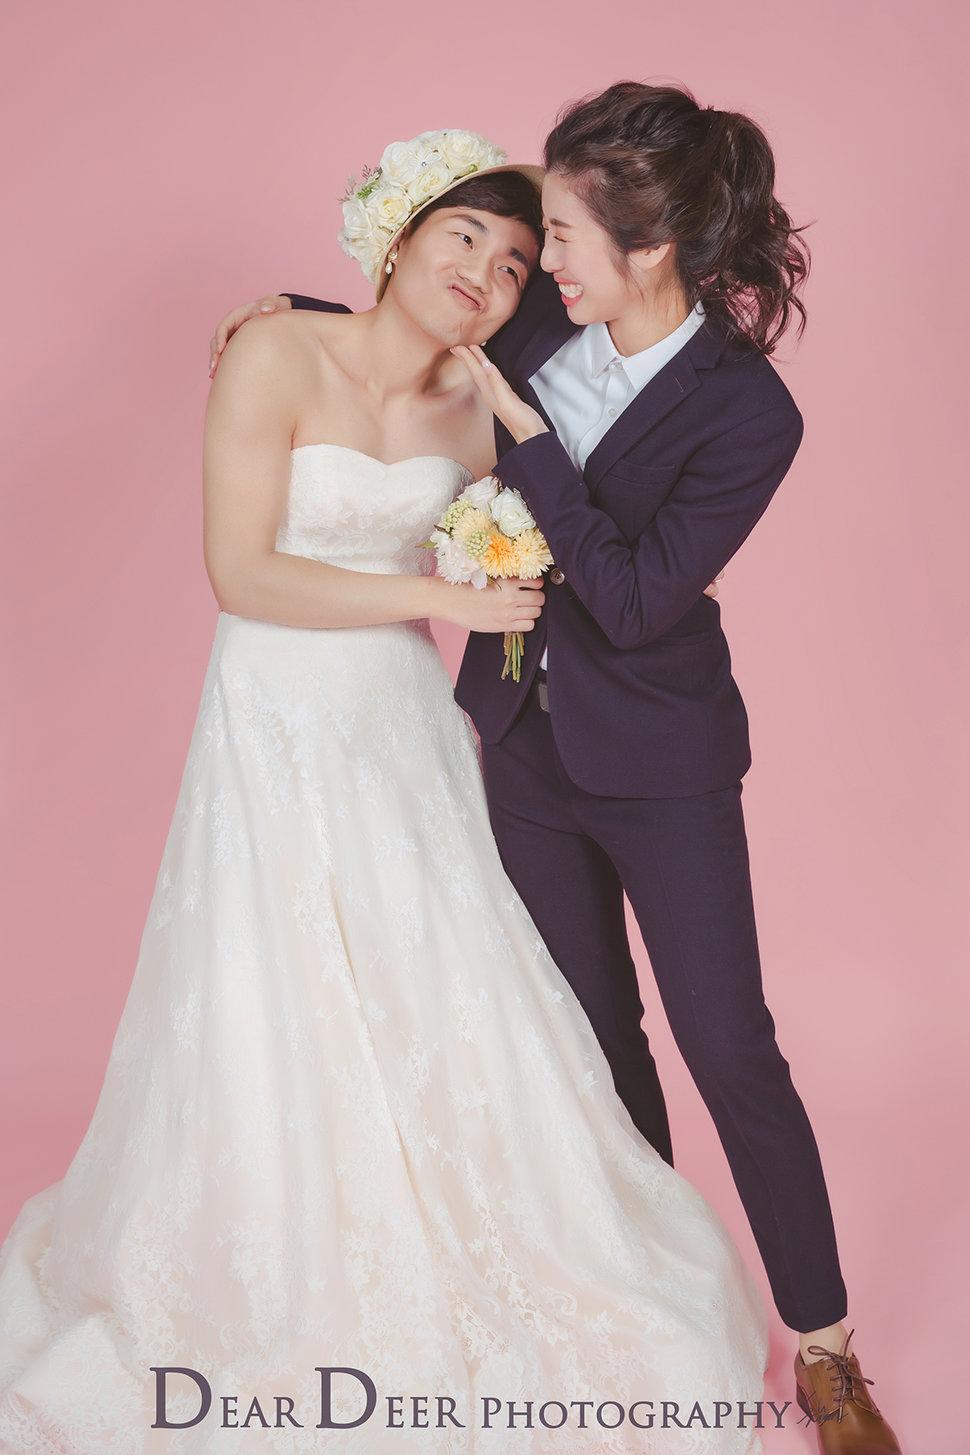 Dear Deer 經典韓系棚拍(編號:2822835) - Dear Deer鹿兒攝影 女攝影師蘇蔓 - 結婚吧